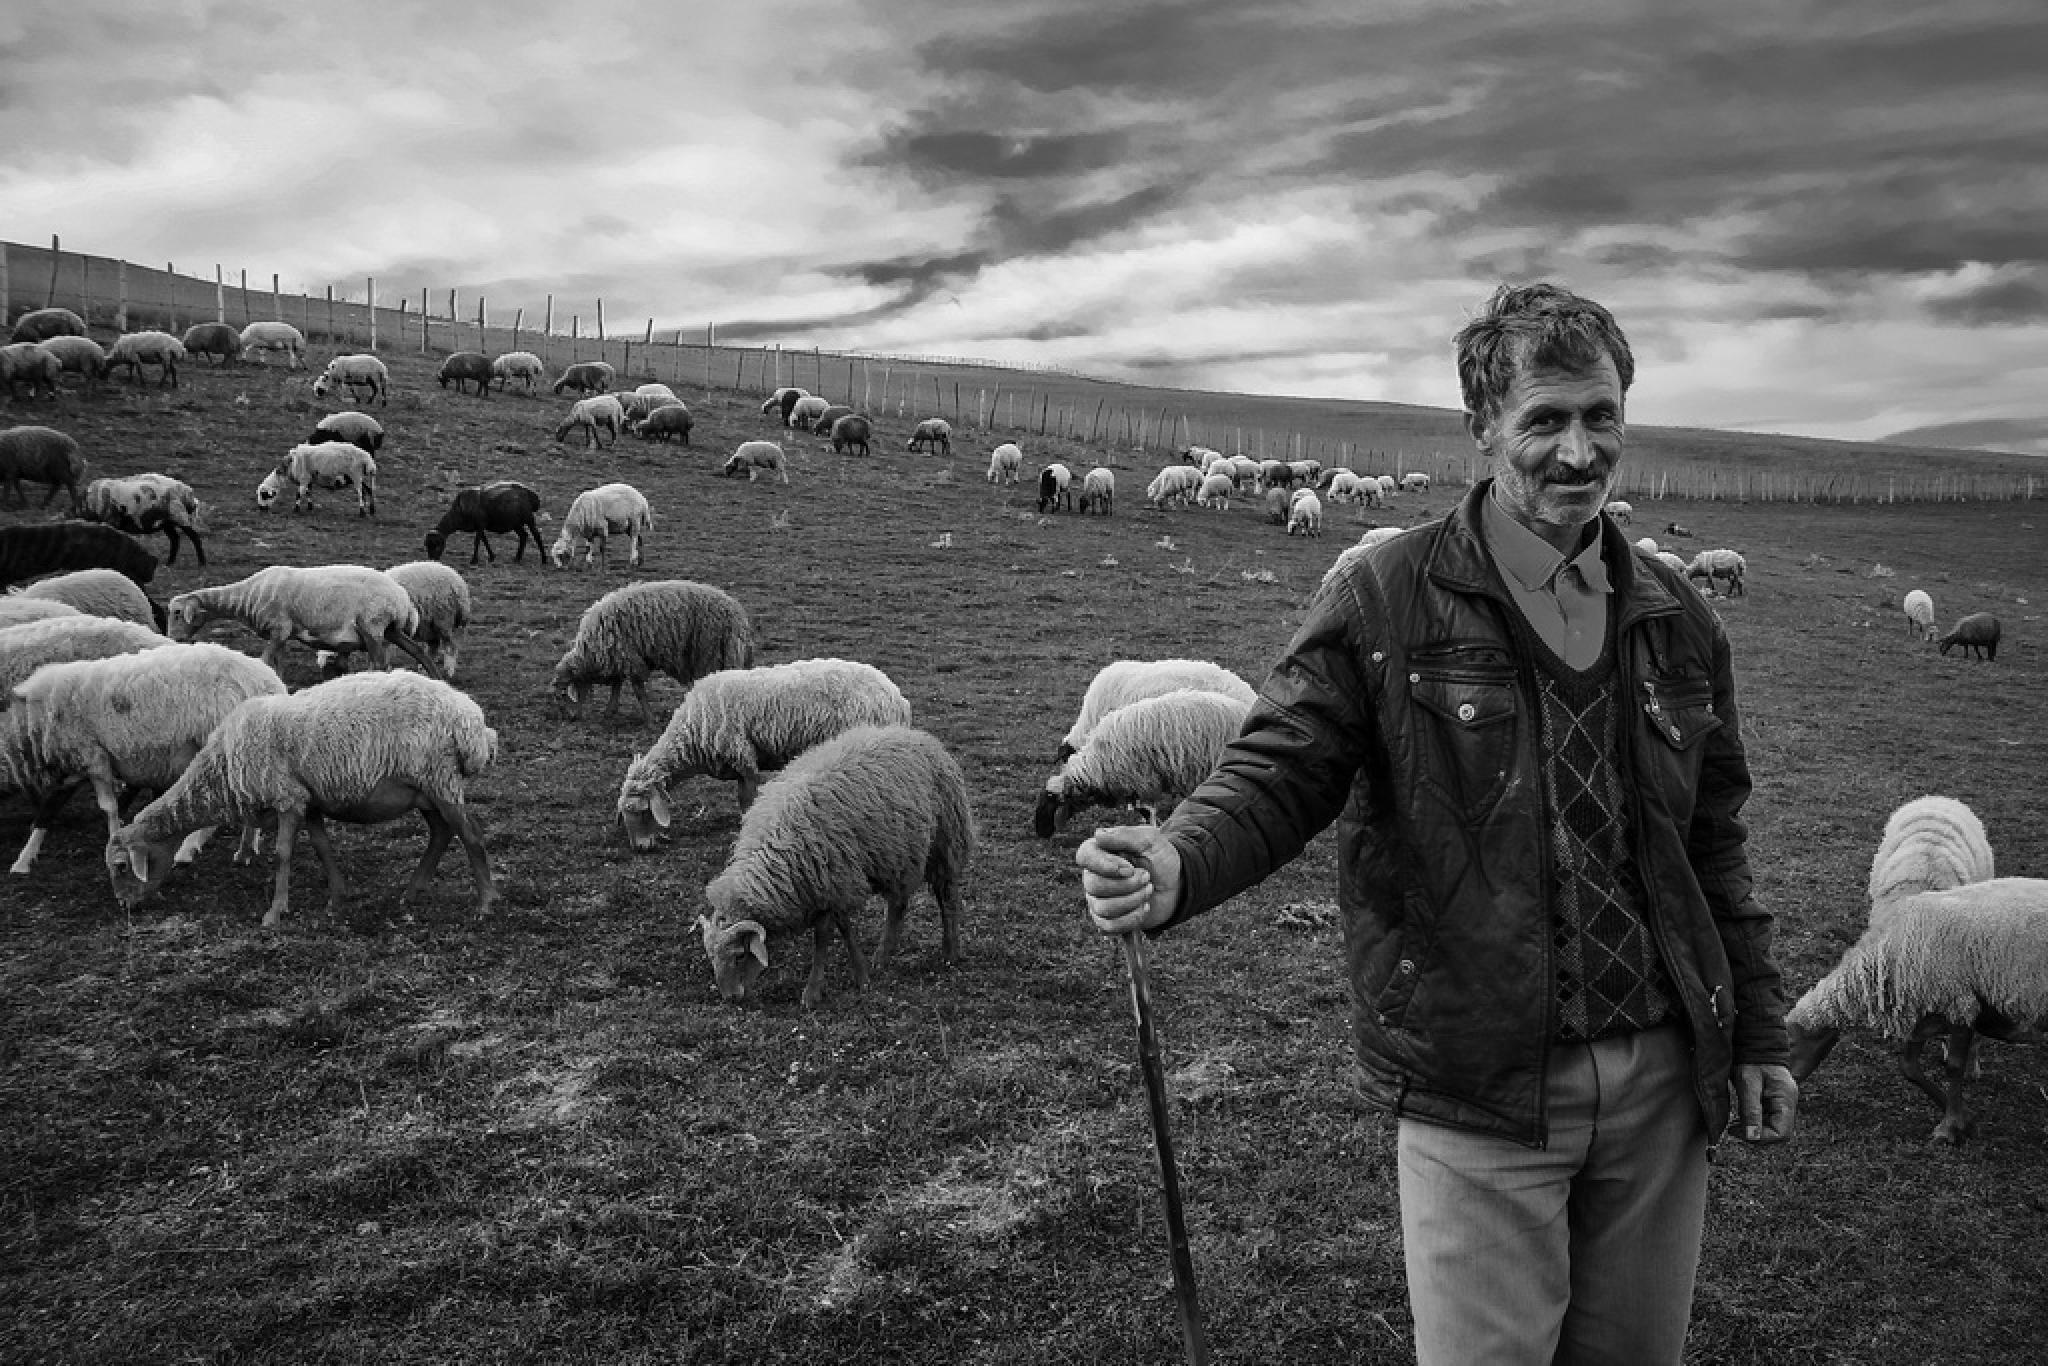 shepherd by Mostafa Mirtaleb